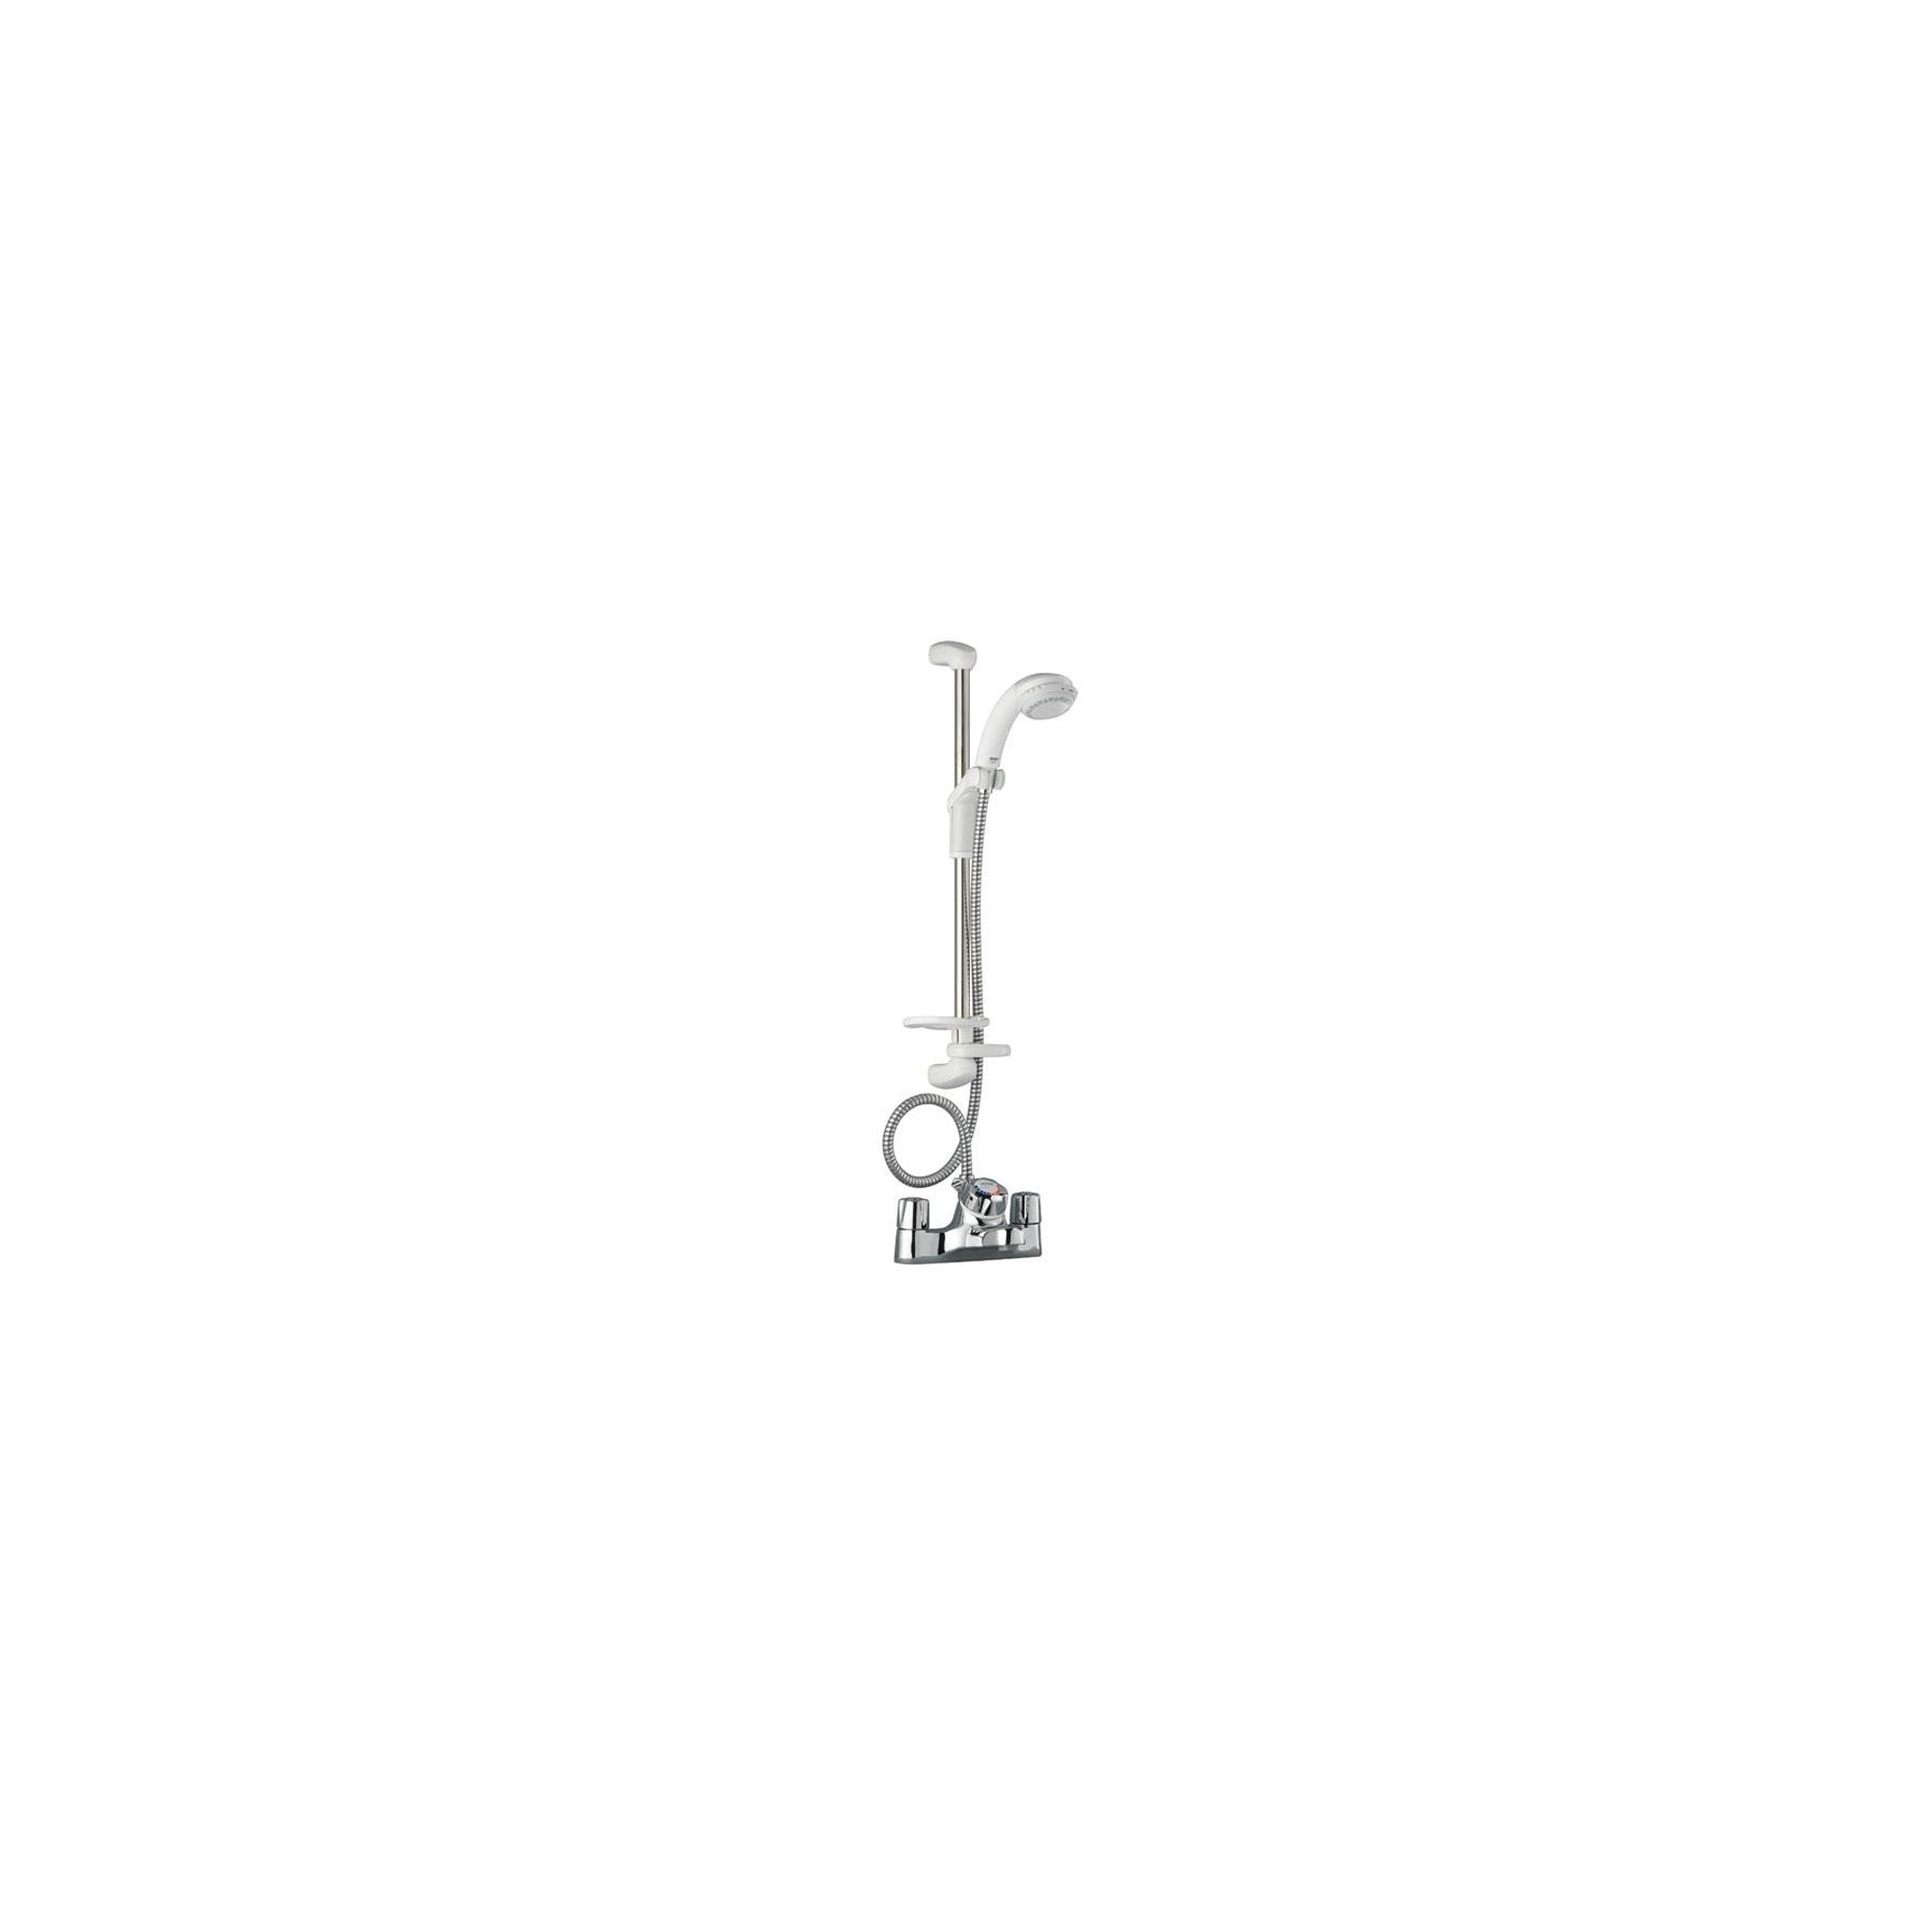 Mira Extra EV Bath Shower Mixer and Kit White / Chrome at Tesco Direct